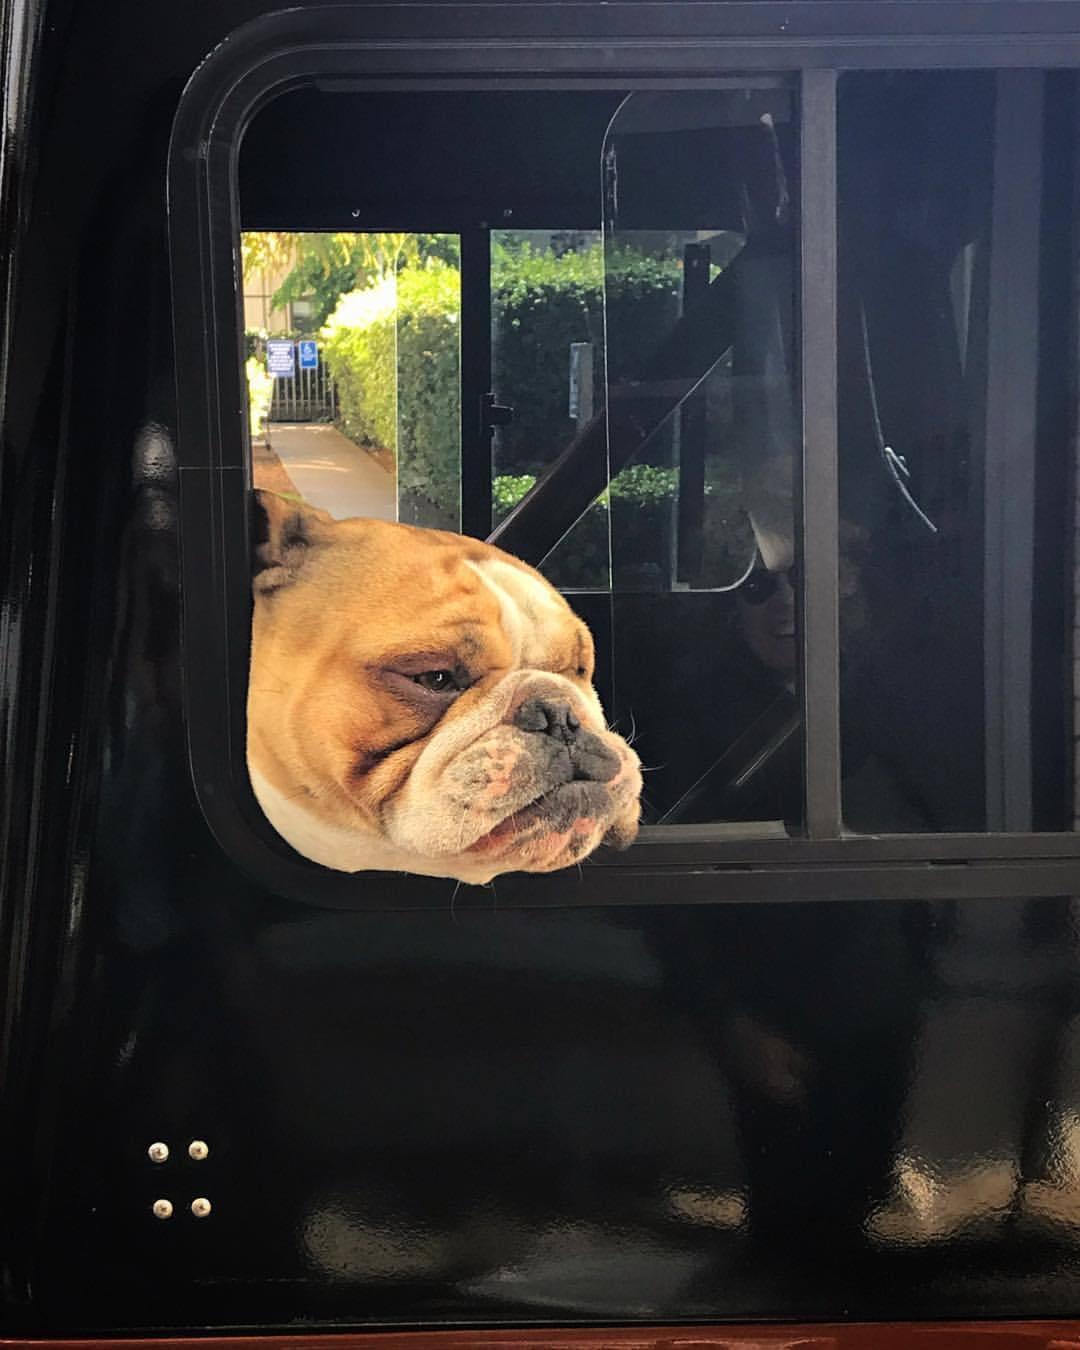 Was that Winston Churchill chilling in the back of a Jeep Cherokee?  -  #ilovedogs #bulldog #california  (at Petaluma, California)